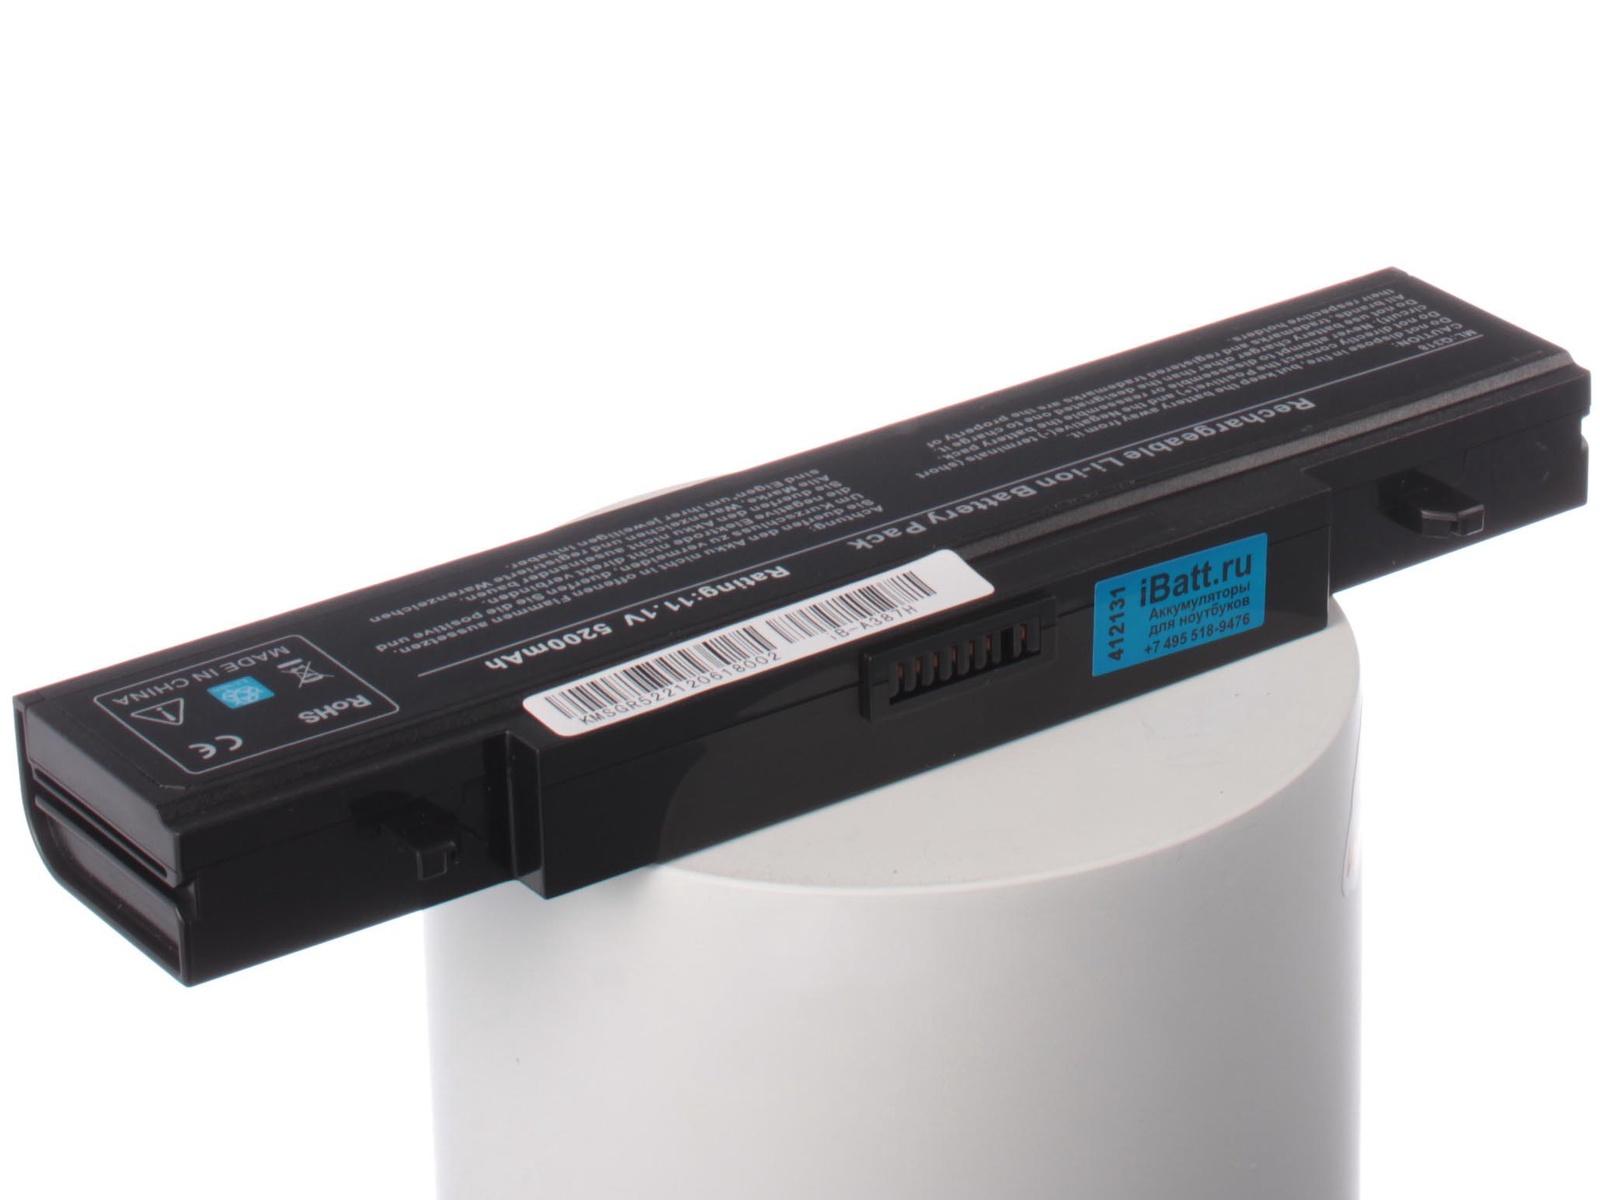 Аккумулятор для ноутбука iBatt для Samsung 350V5X-S01, R425-JU02, SA31, 300V5A-S19, R540-JT02, NP-R505, R540-JS09, 300E5A-A06, 355V5C-S04, 300E4A-A05, 355V5C-S0M, P580 PRO, 300E5C-A0D, 355V5X-S02, R525-JT03, RV515-S09, R525-JV01 аккумулятор для ноутбука anybatt для samsung r540 jt01 np365e5c r730 jt02 300e5c u04 300v5a s1c r540 jt03 r730 ja03 r780 jt01 rf710 s02 270e5e k03 305e7a s01 350e5c s07 550p7c s03 np q430 np r523 r540 js0b